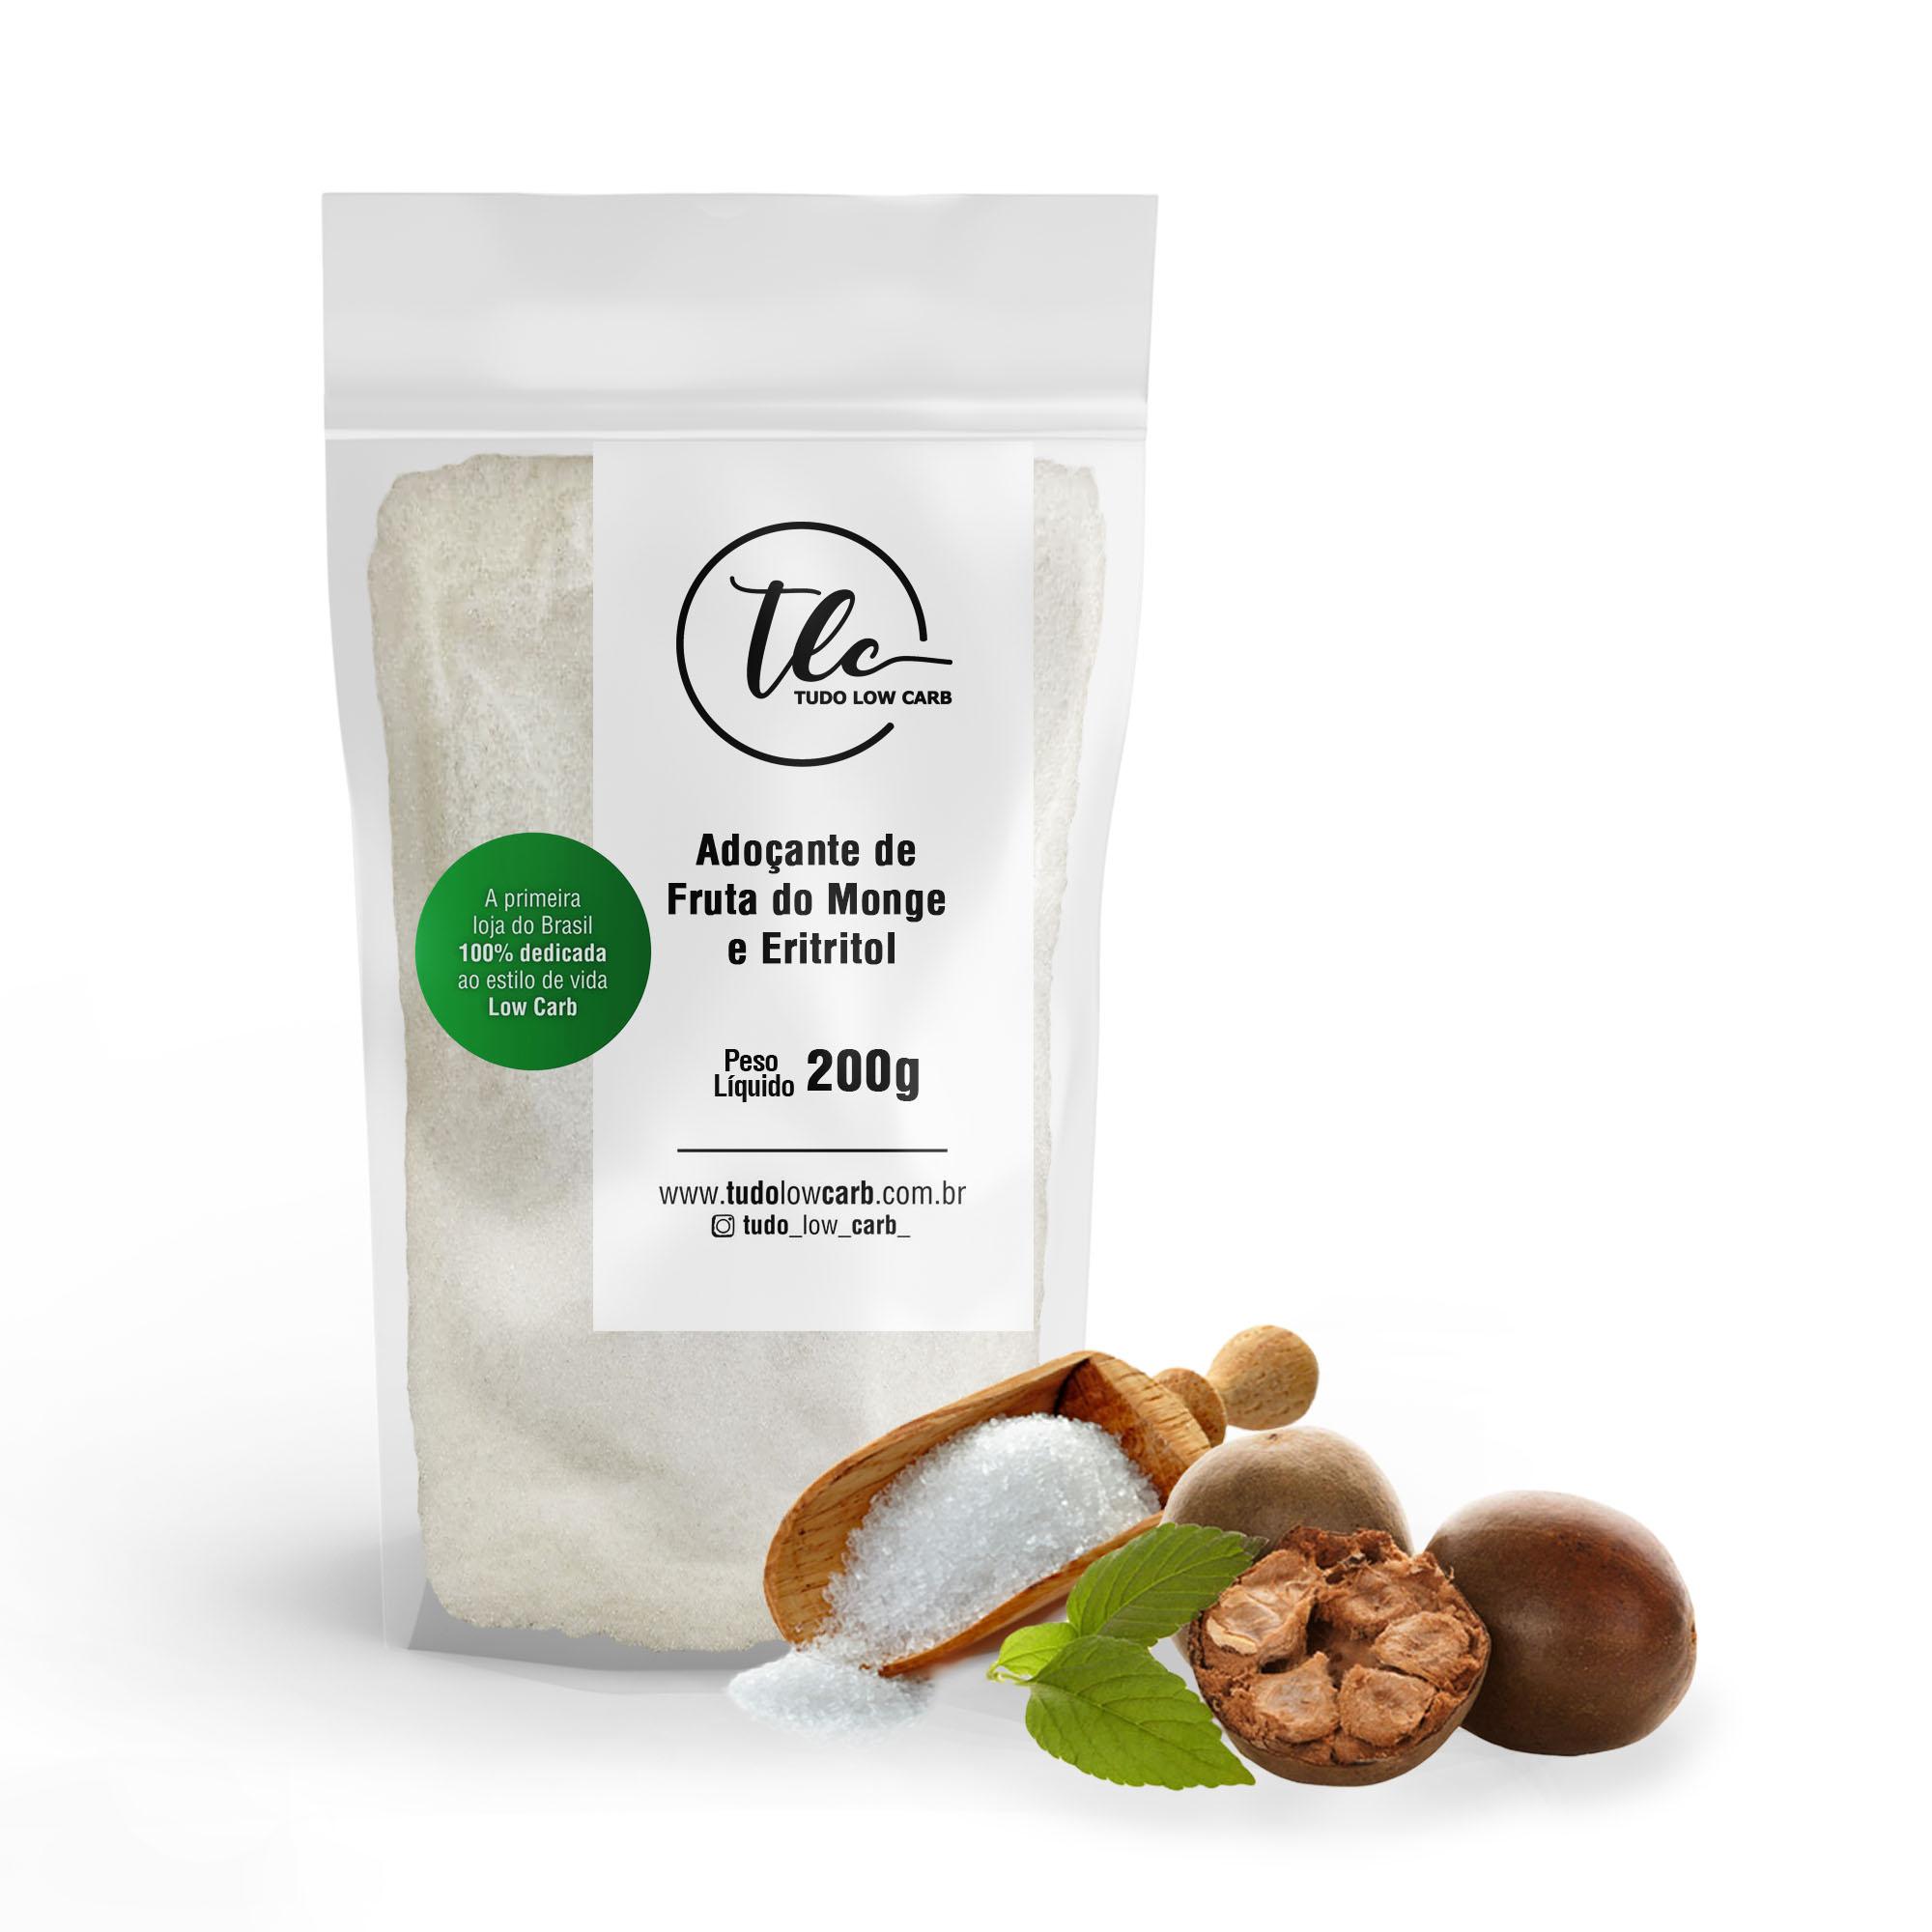 Adoçante de Fruta do Monge e Eritritol (Monk Fruit + Erythritol) 200g  - TLC Tudo Low Carb